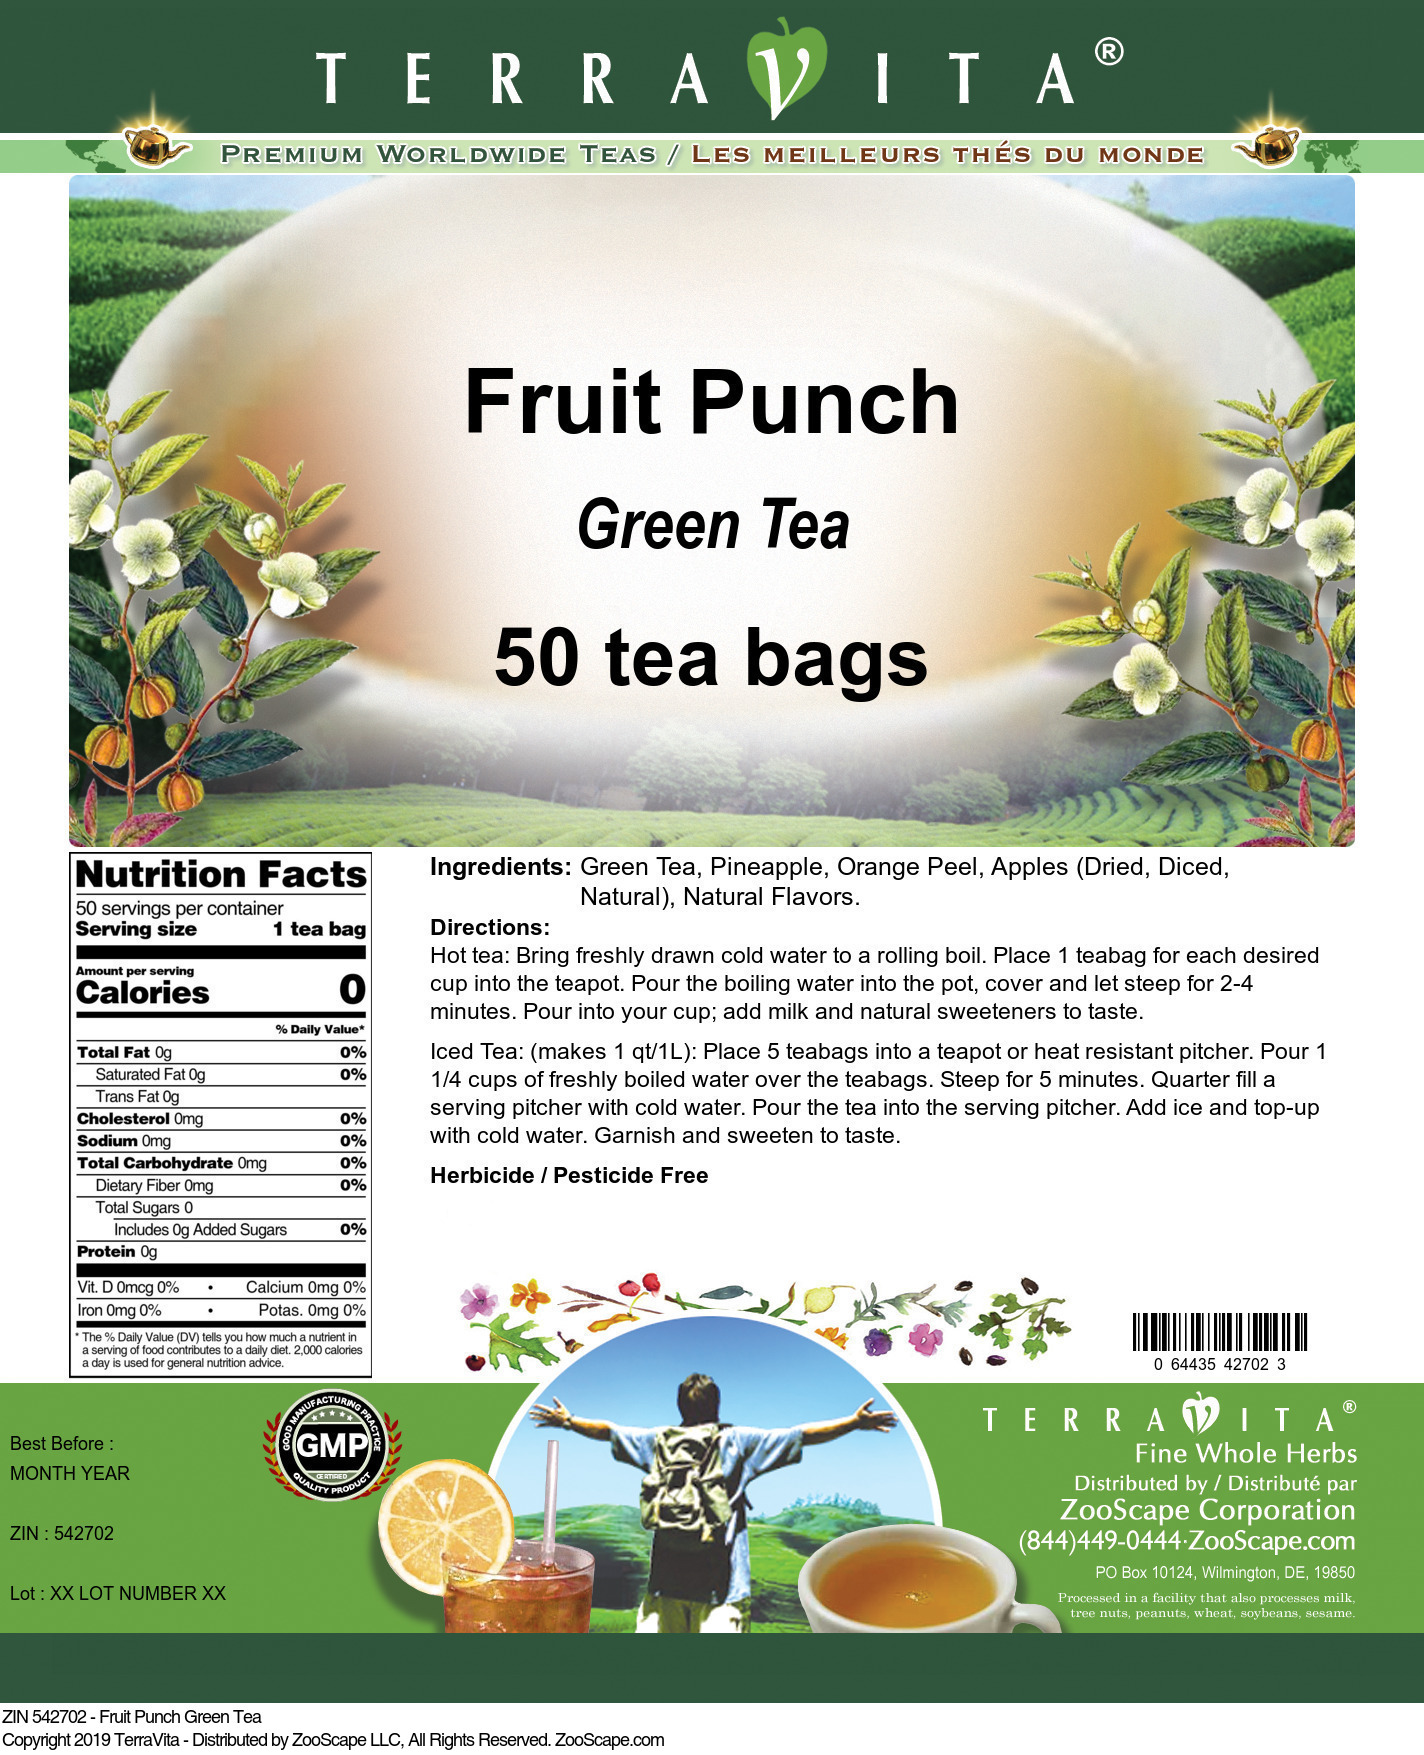 Fruit Punch Green Tea